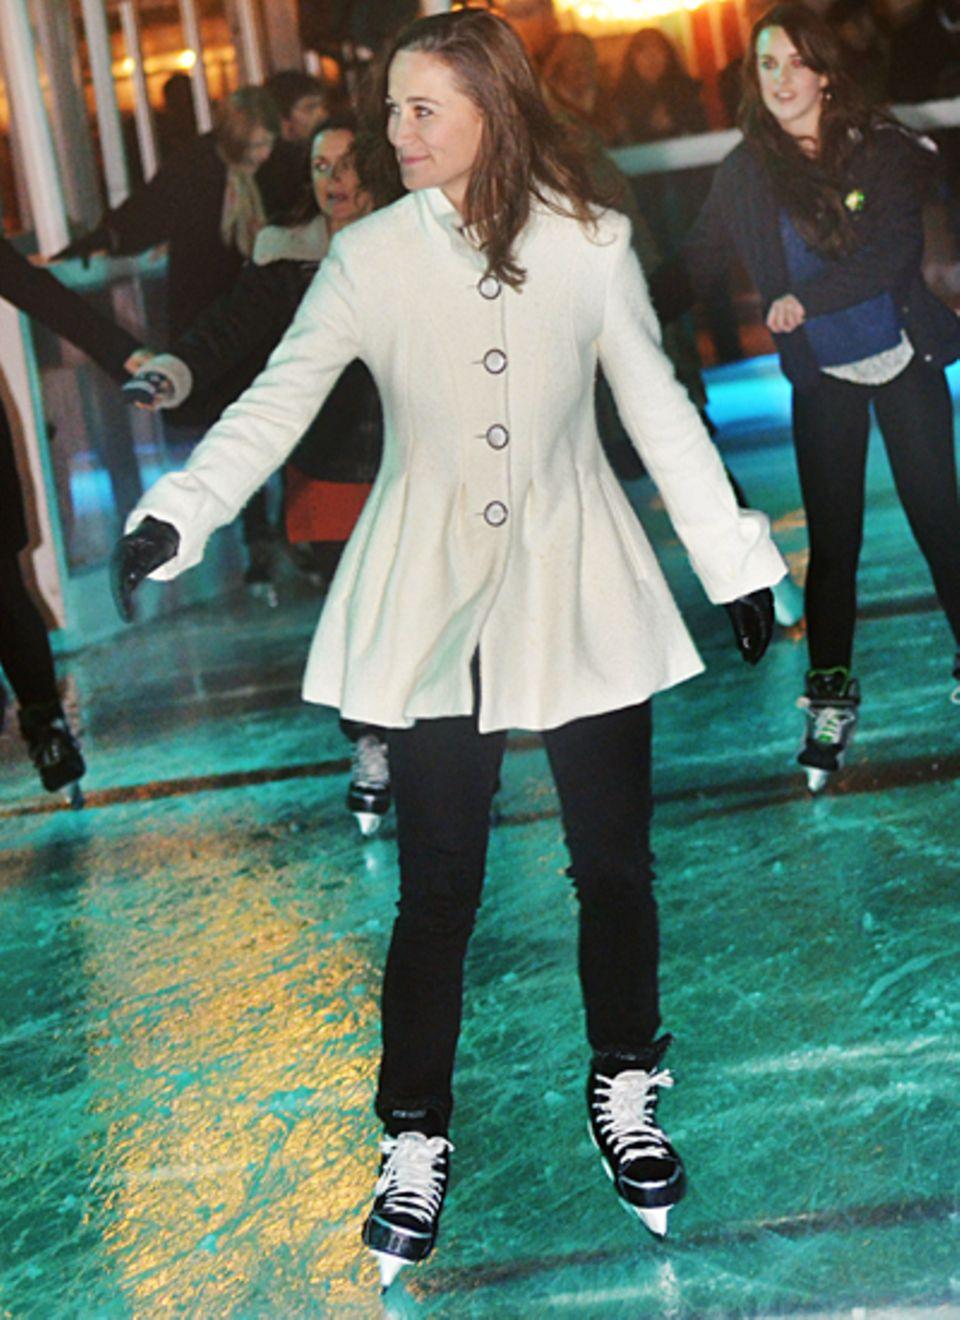 Pippa Middleton skatet übers Eis.